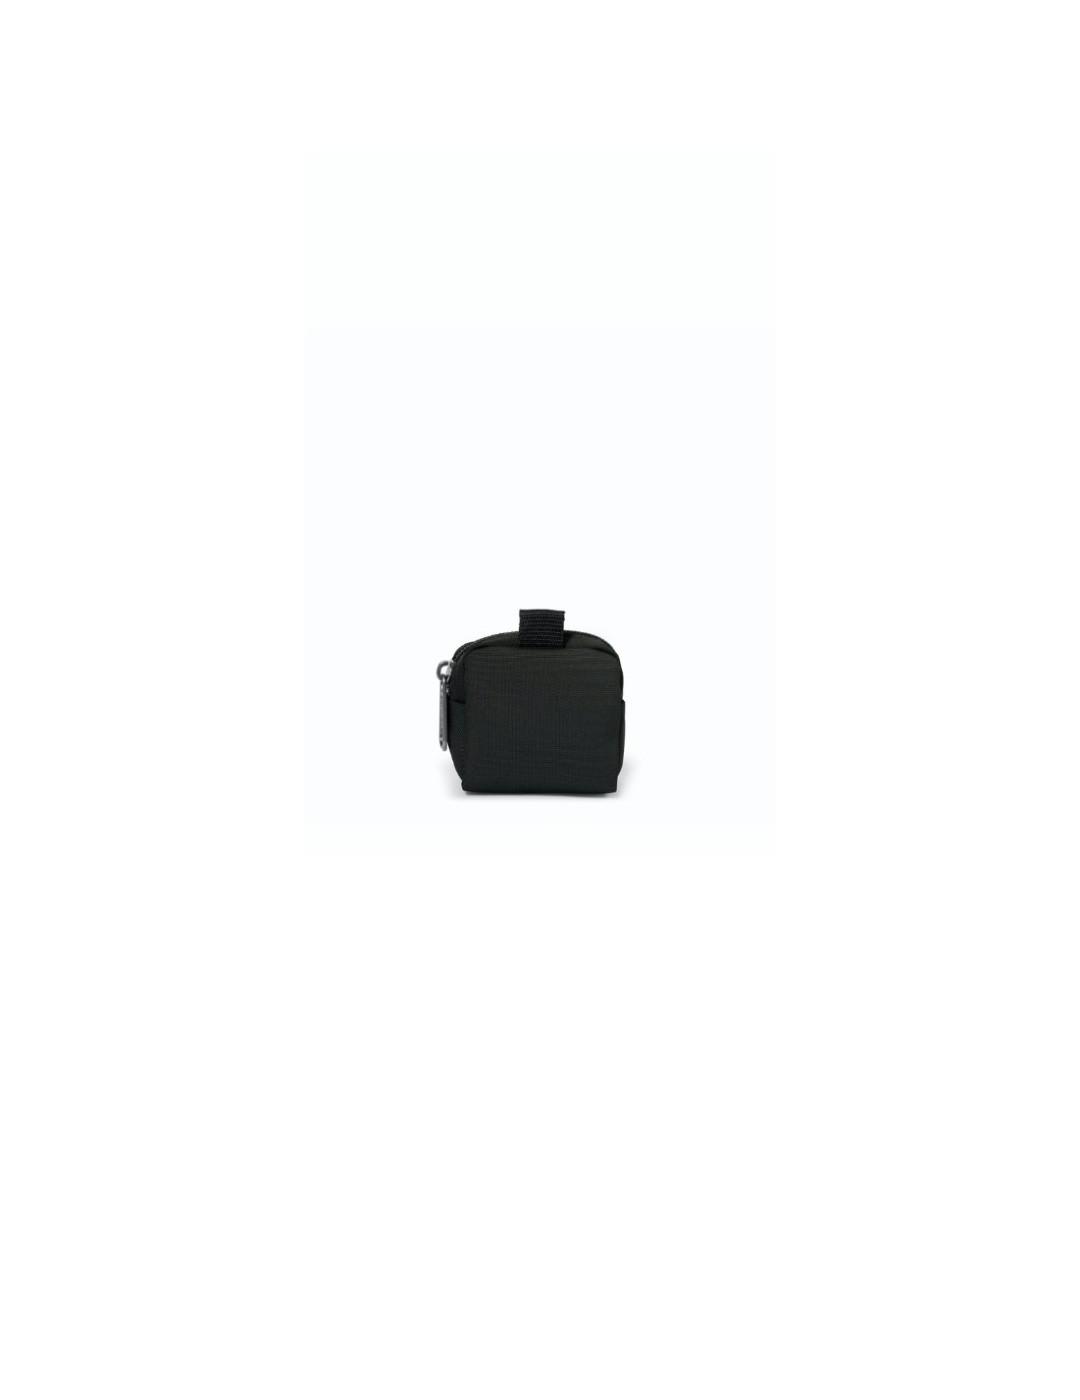 MONEDERO EASTPAK STALKER SINGLE BLACK